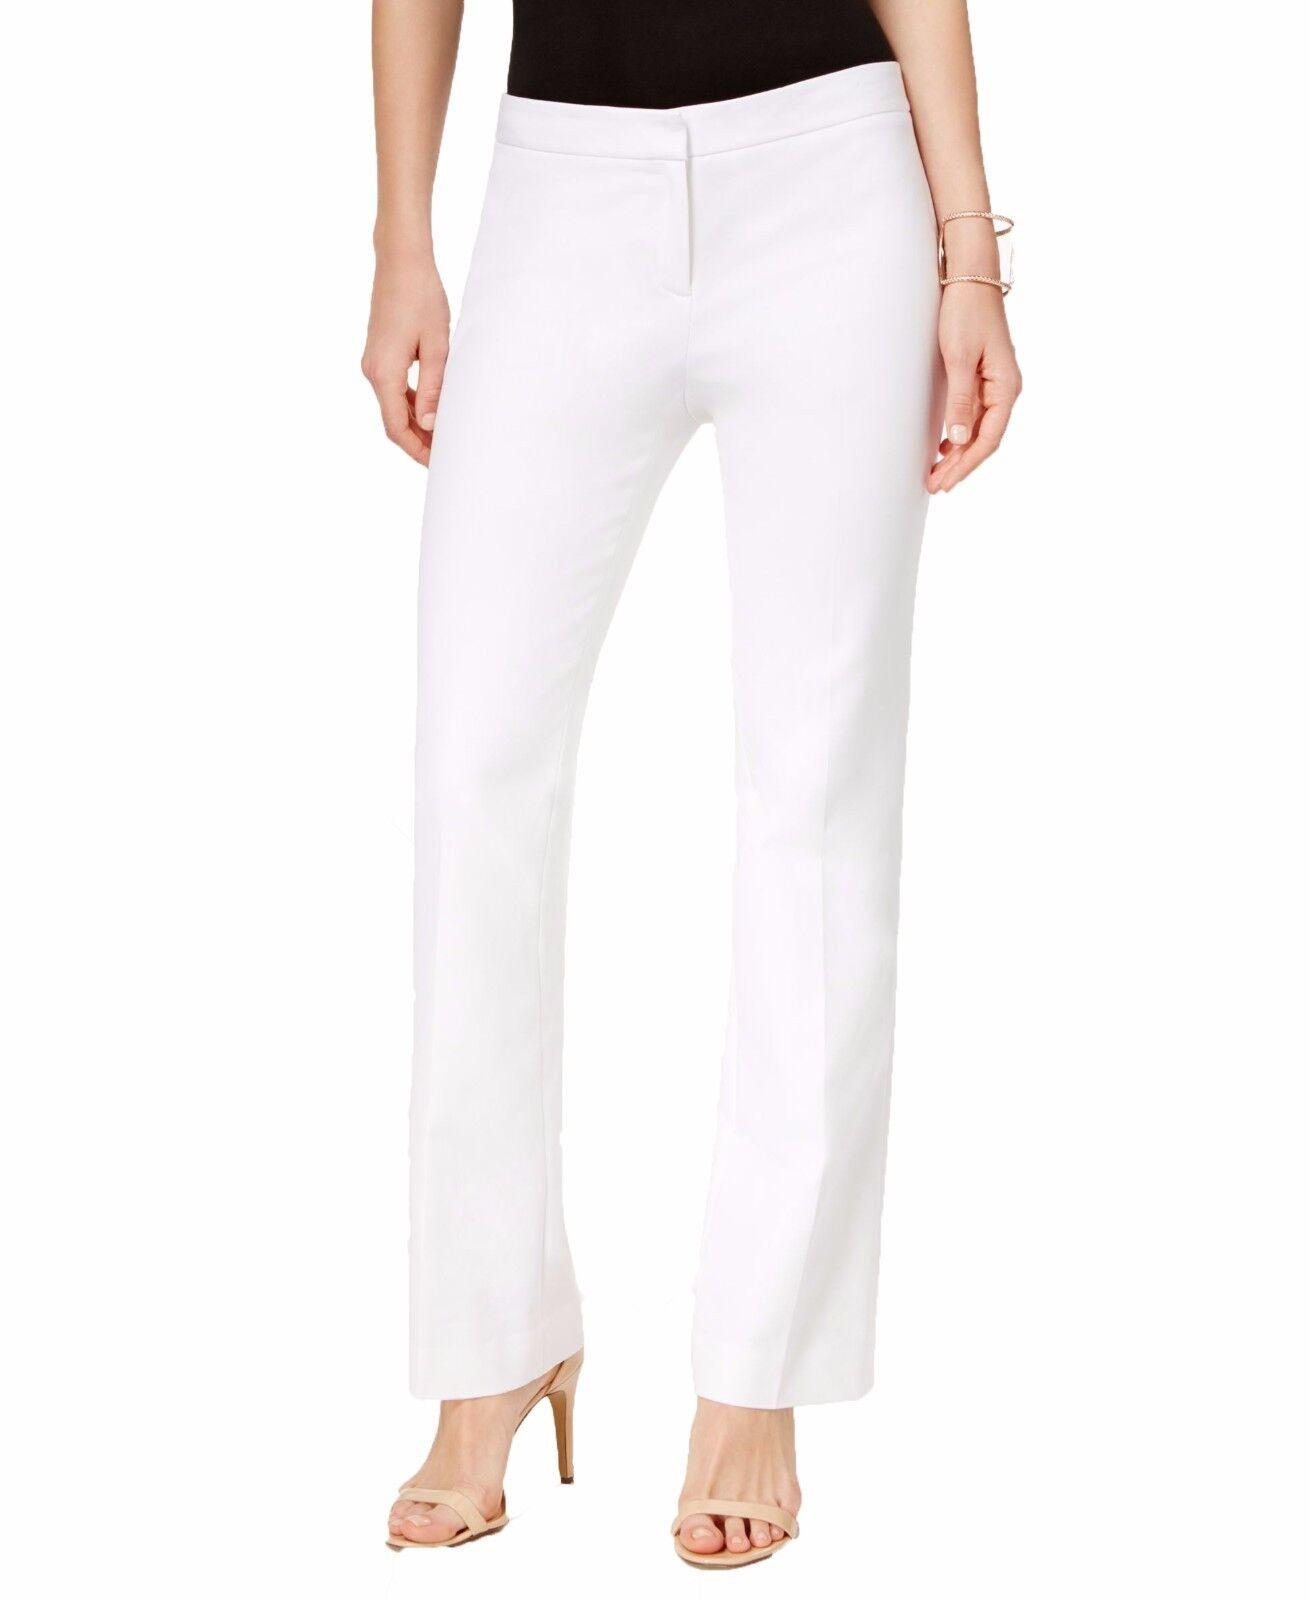 6948-2 Vince Camuto Women's White Flare-leg dress Pants size 14,  89